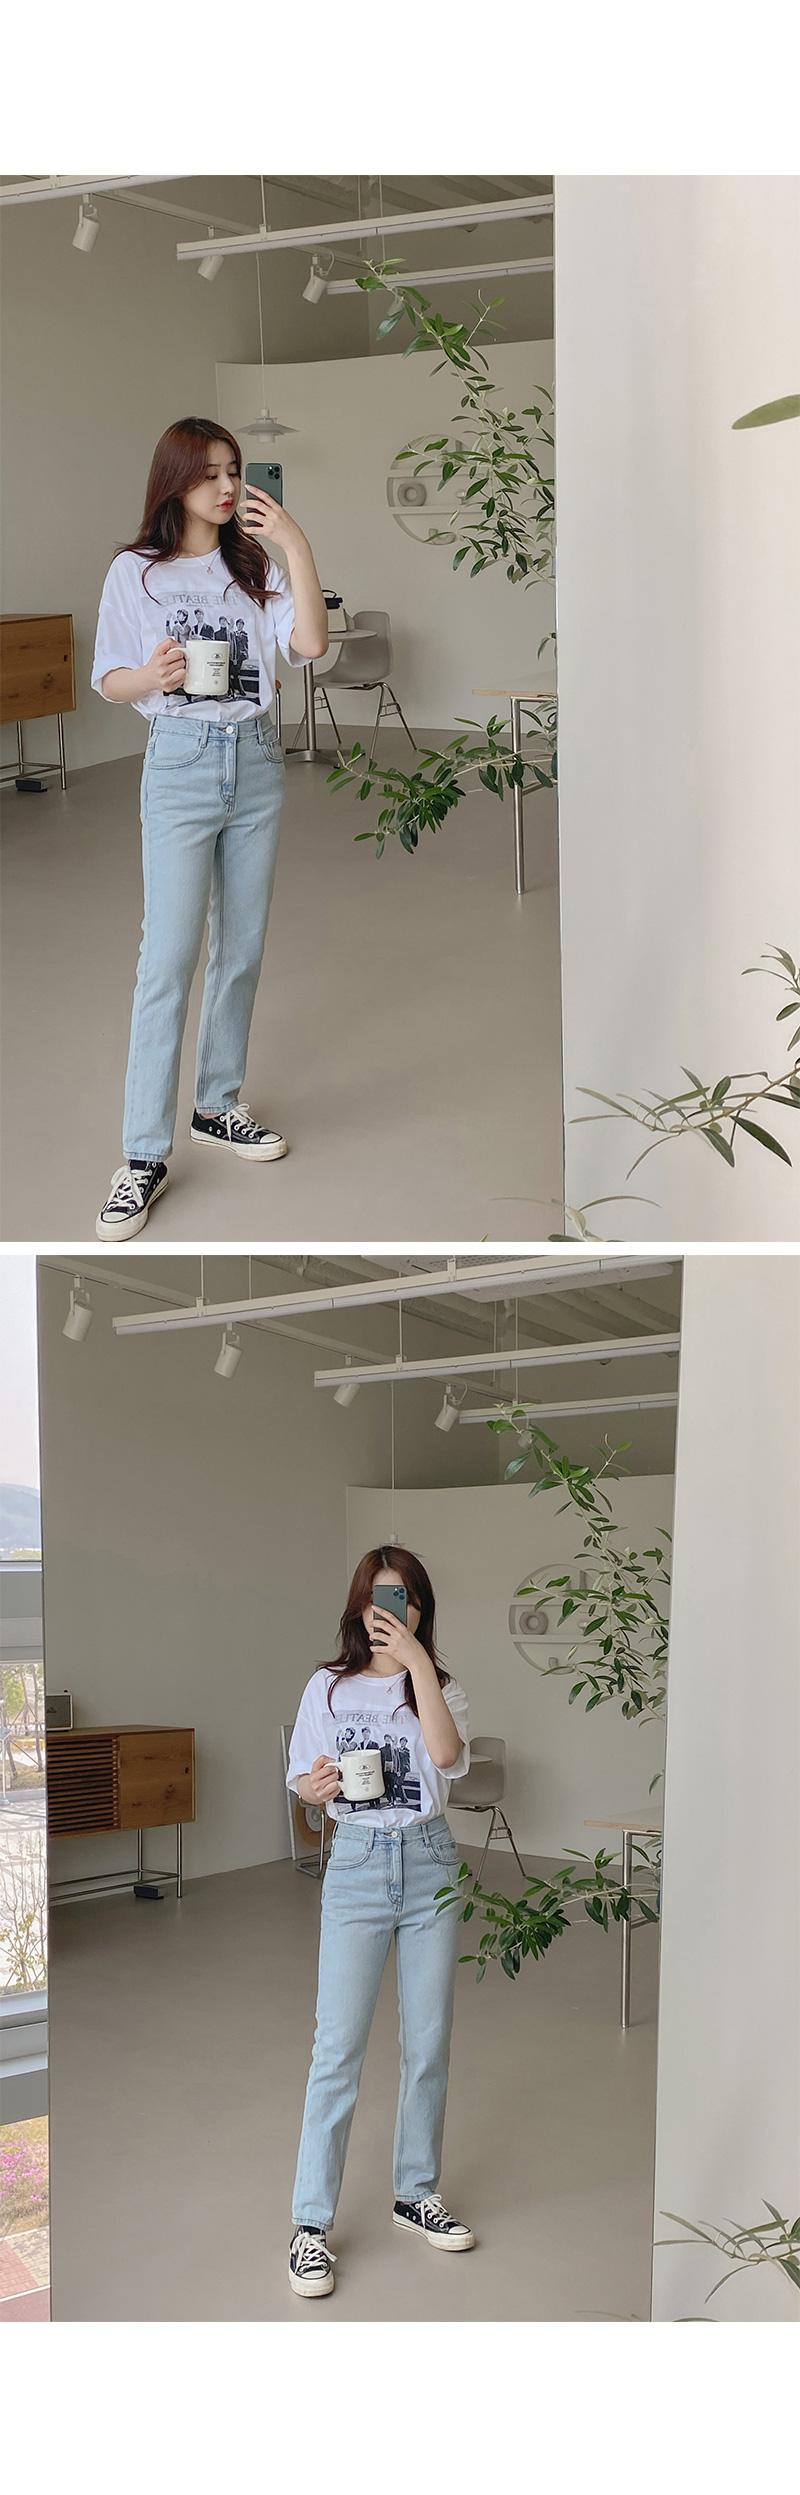 Big 26-32 Inch Terra Faded Denim Straight Pants